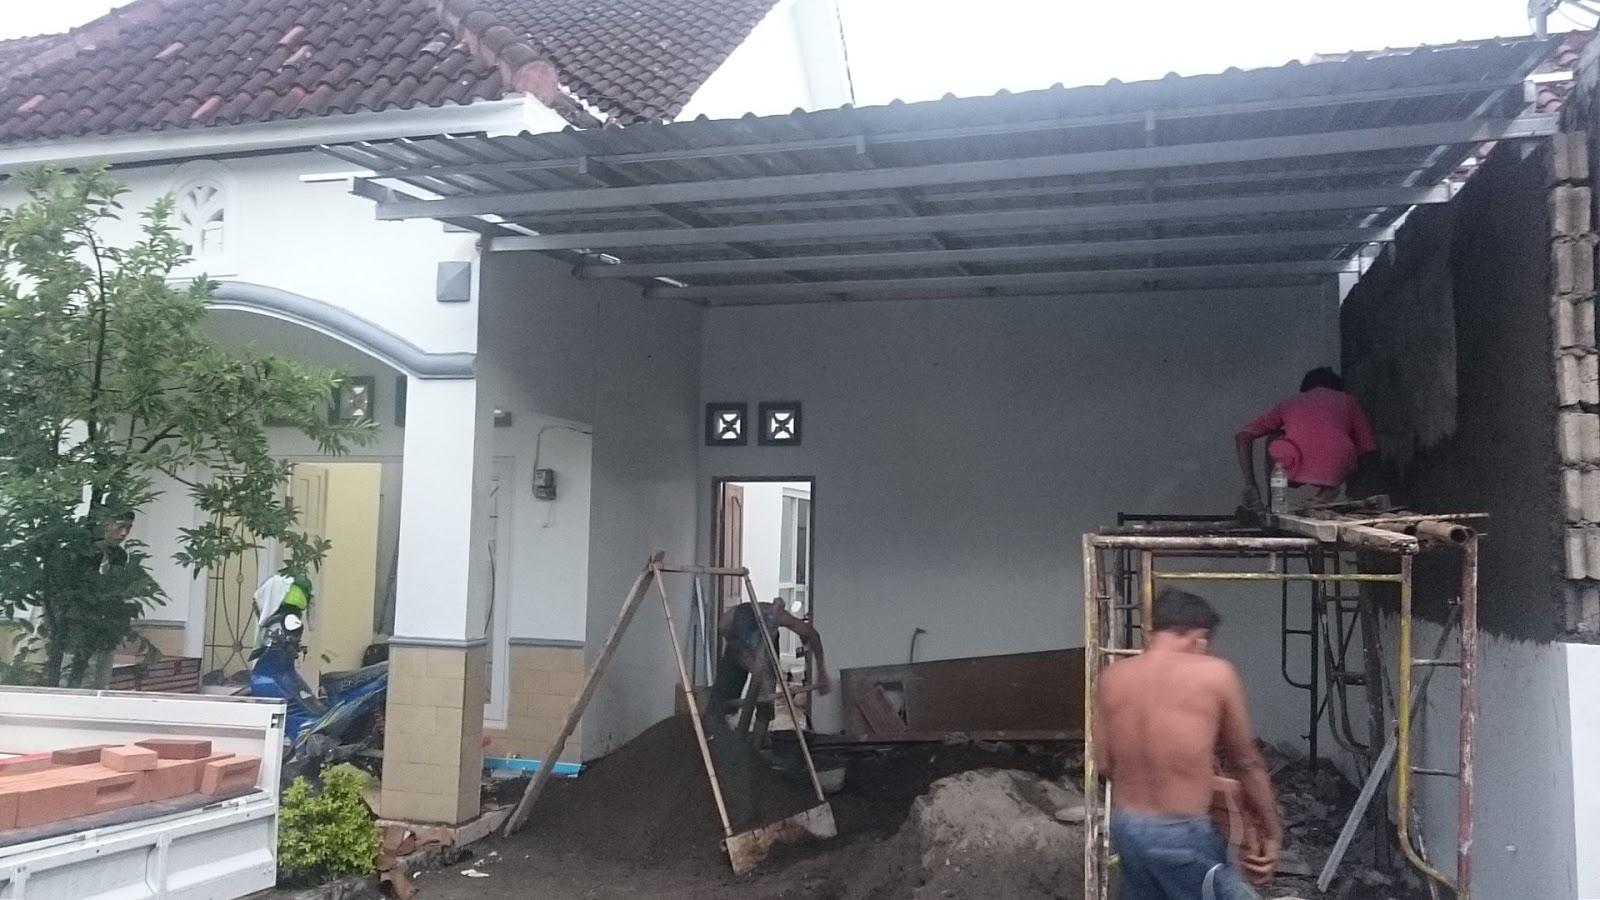 kanopi baja ringan yogyakarta tukang cat rumah gedung dan kantor jogjakarta renovasi